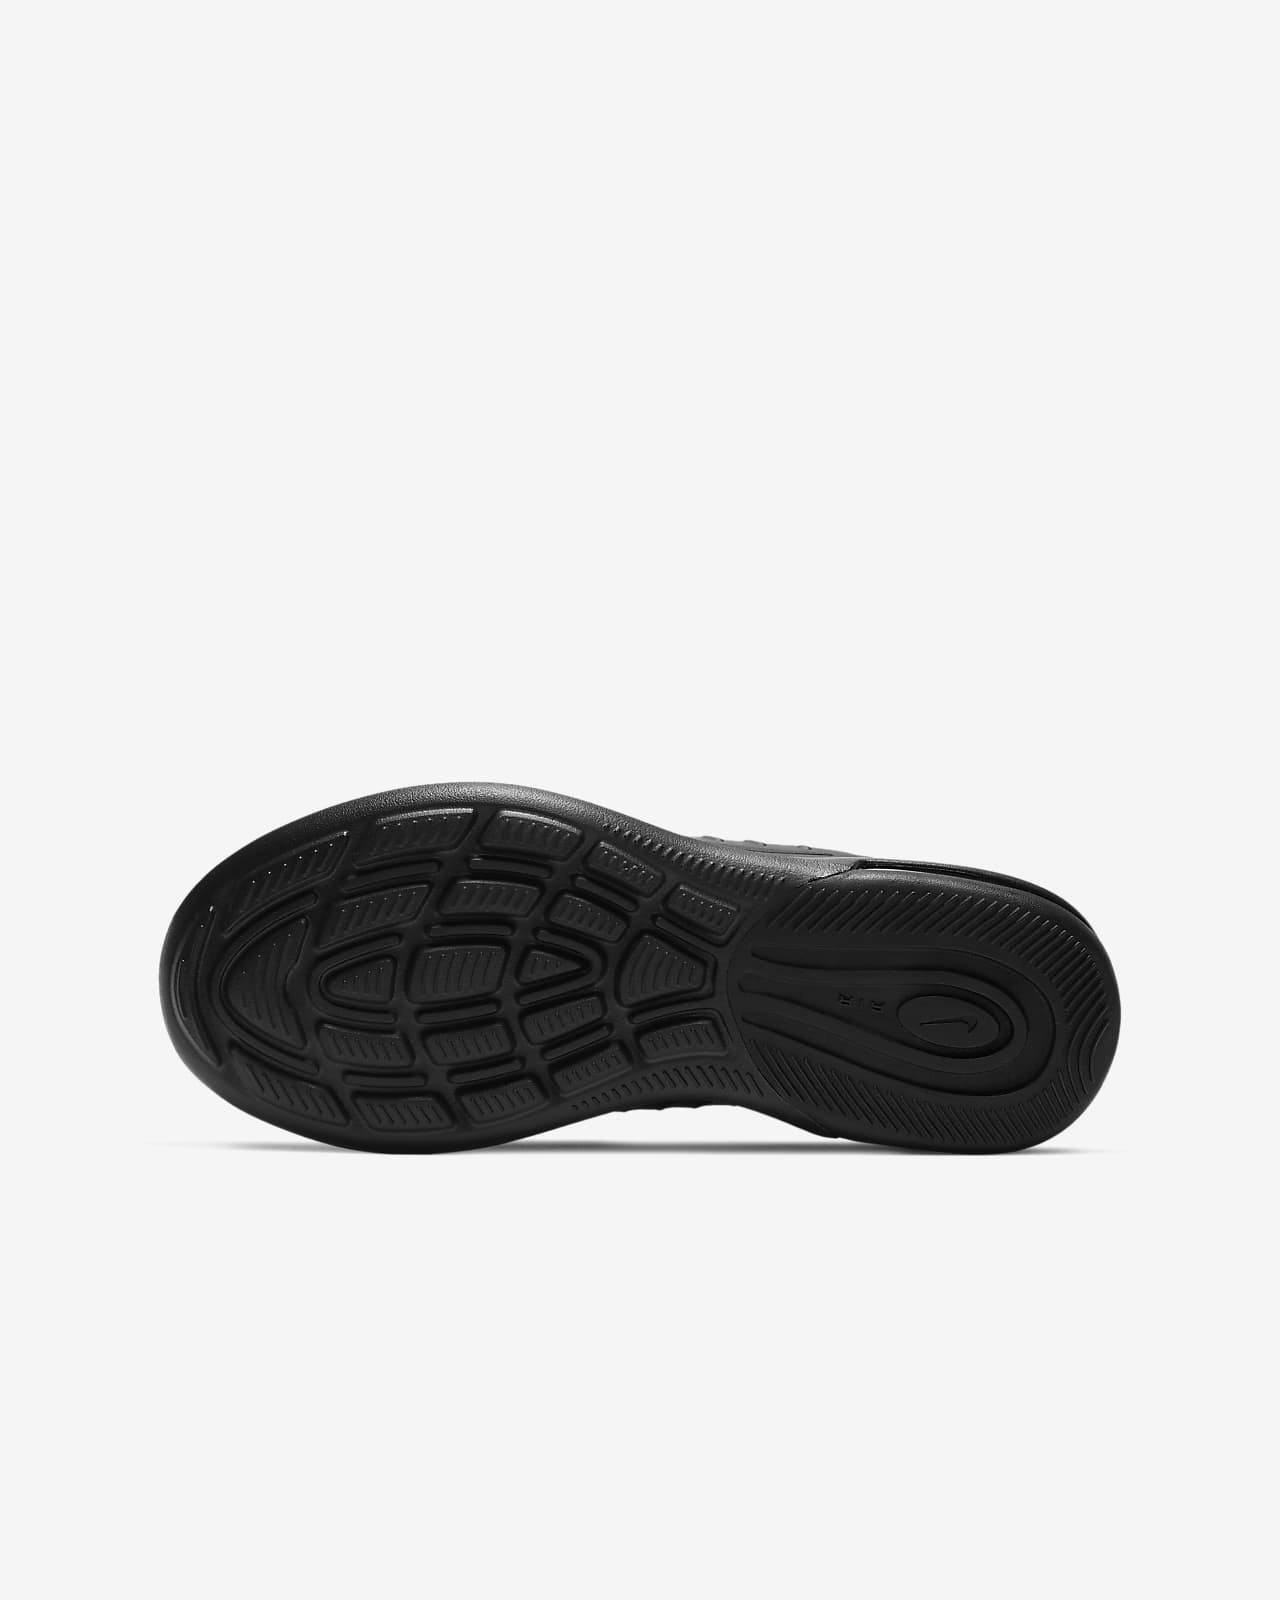 Nike Air Max Axis Big Kids' Shoes